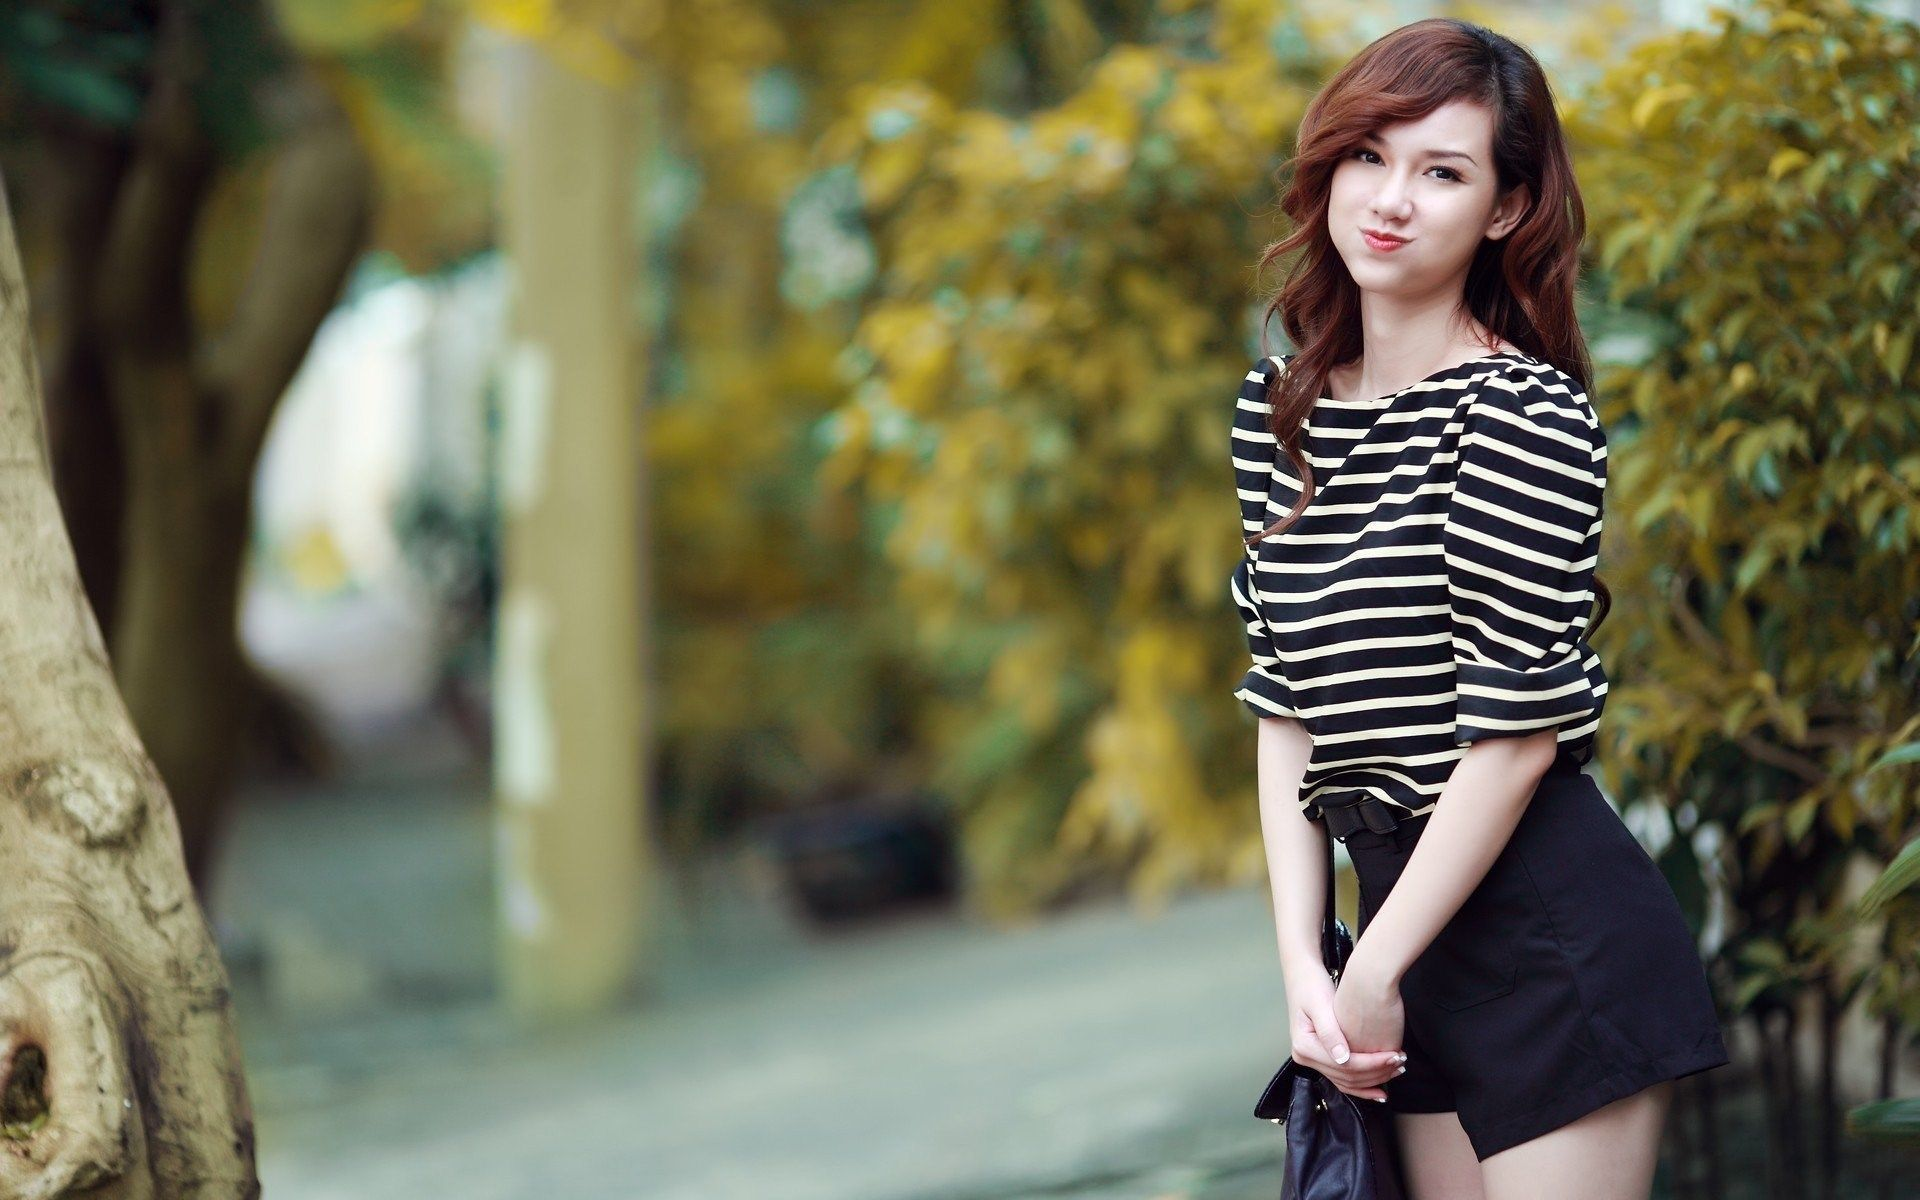 Korean Girls Desktop Wallpapers - Top Free Korean Girls